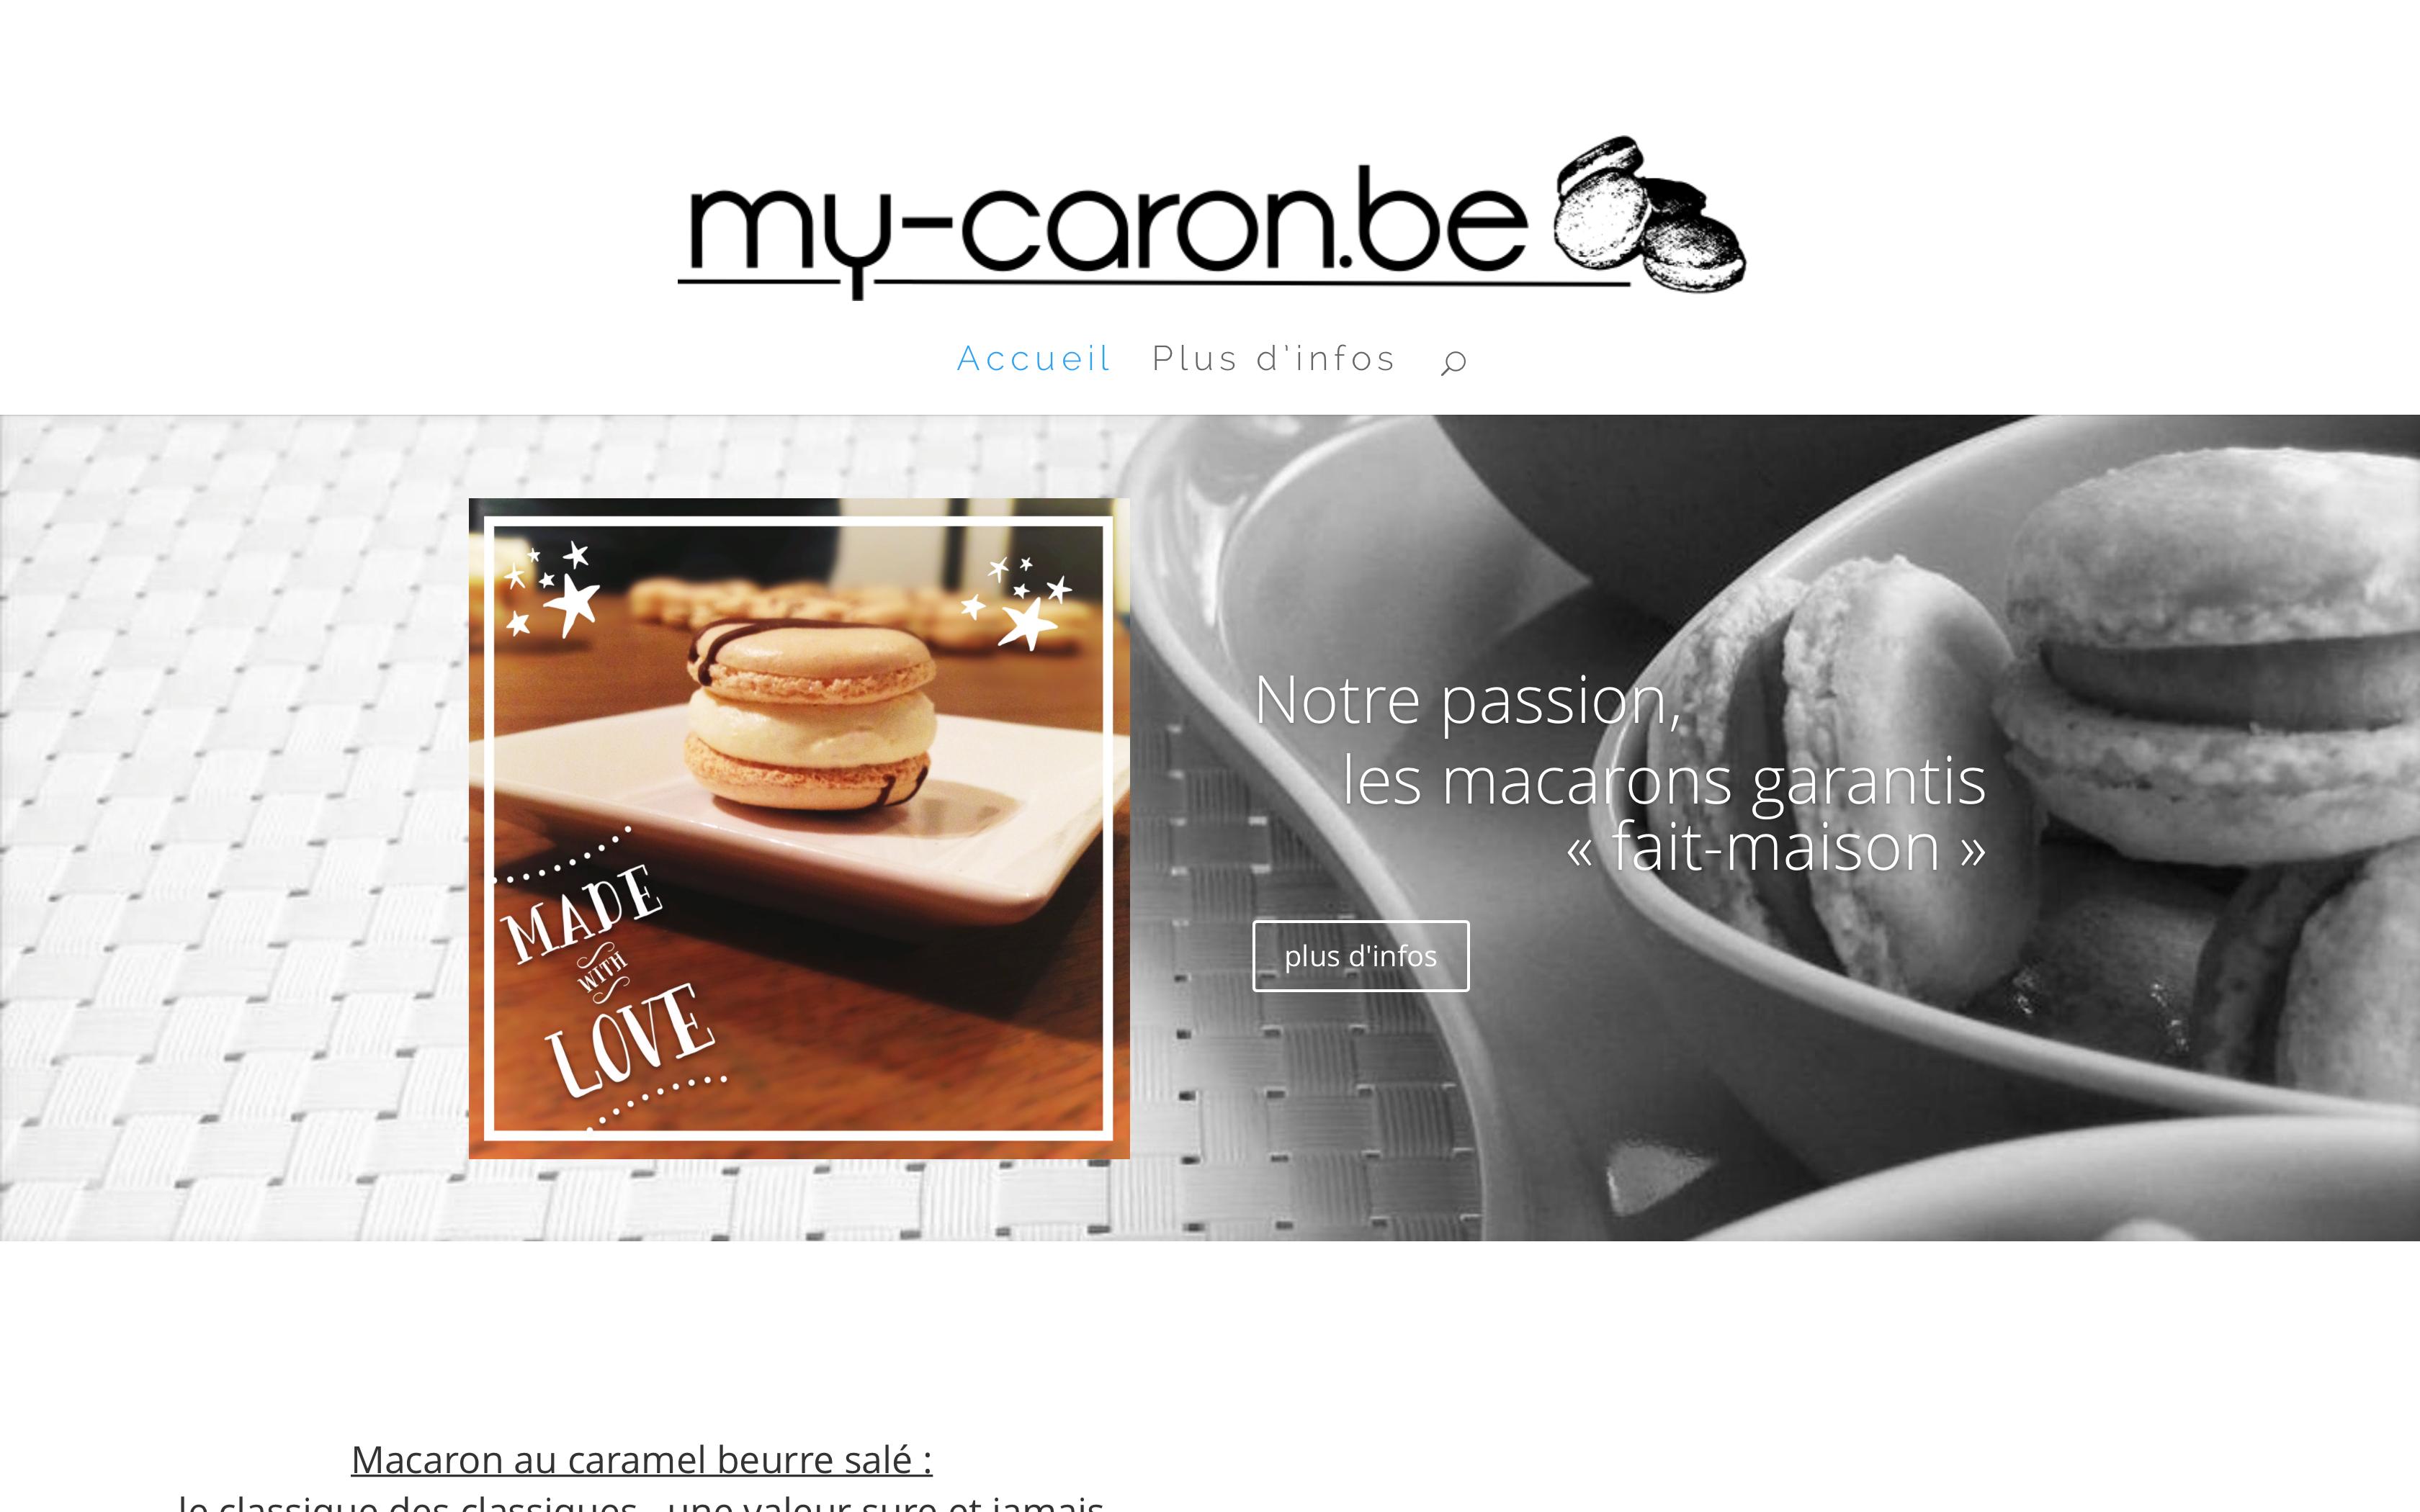 my-caron.be